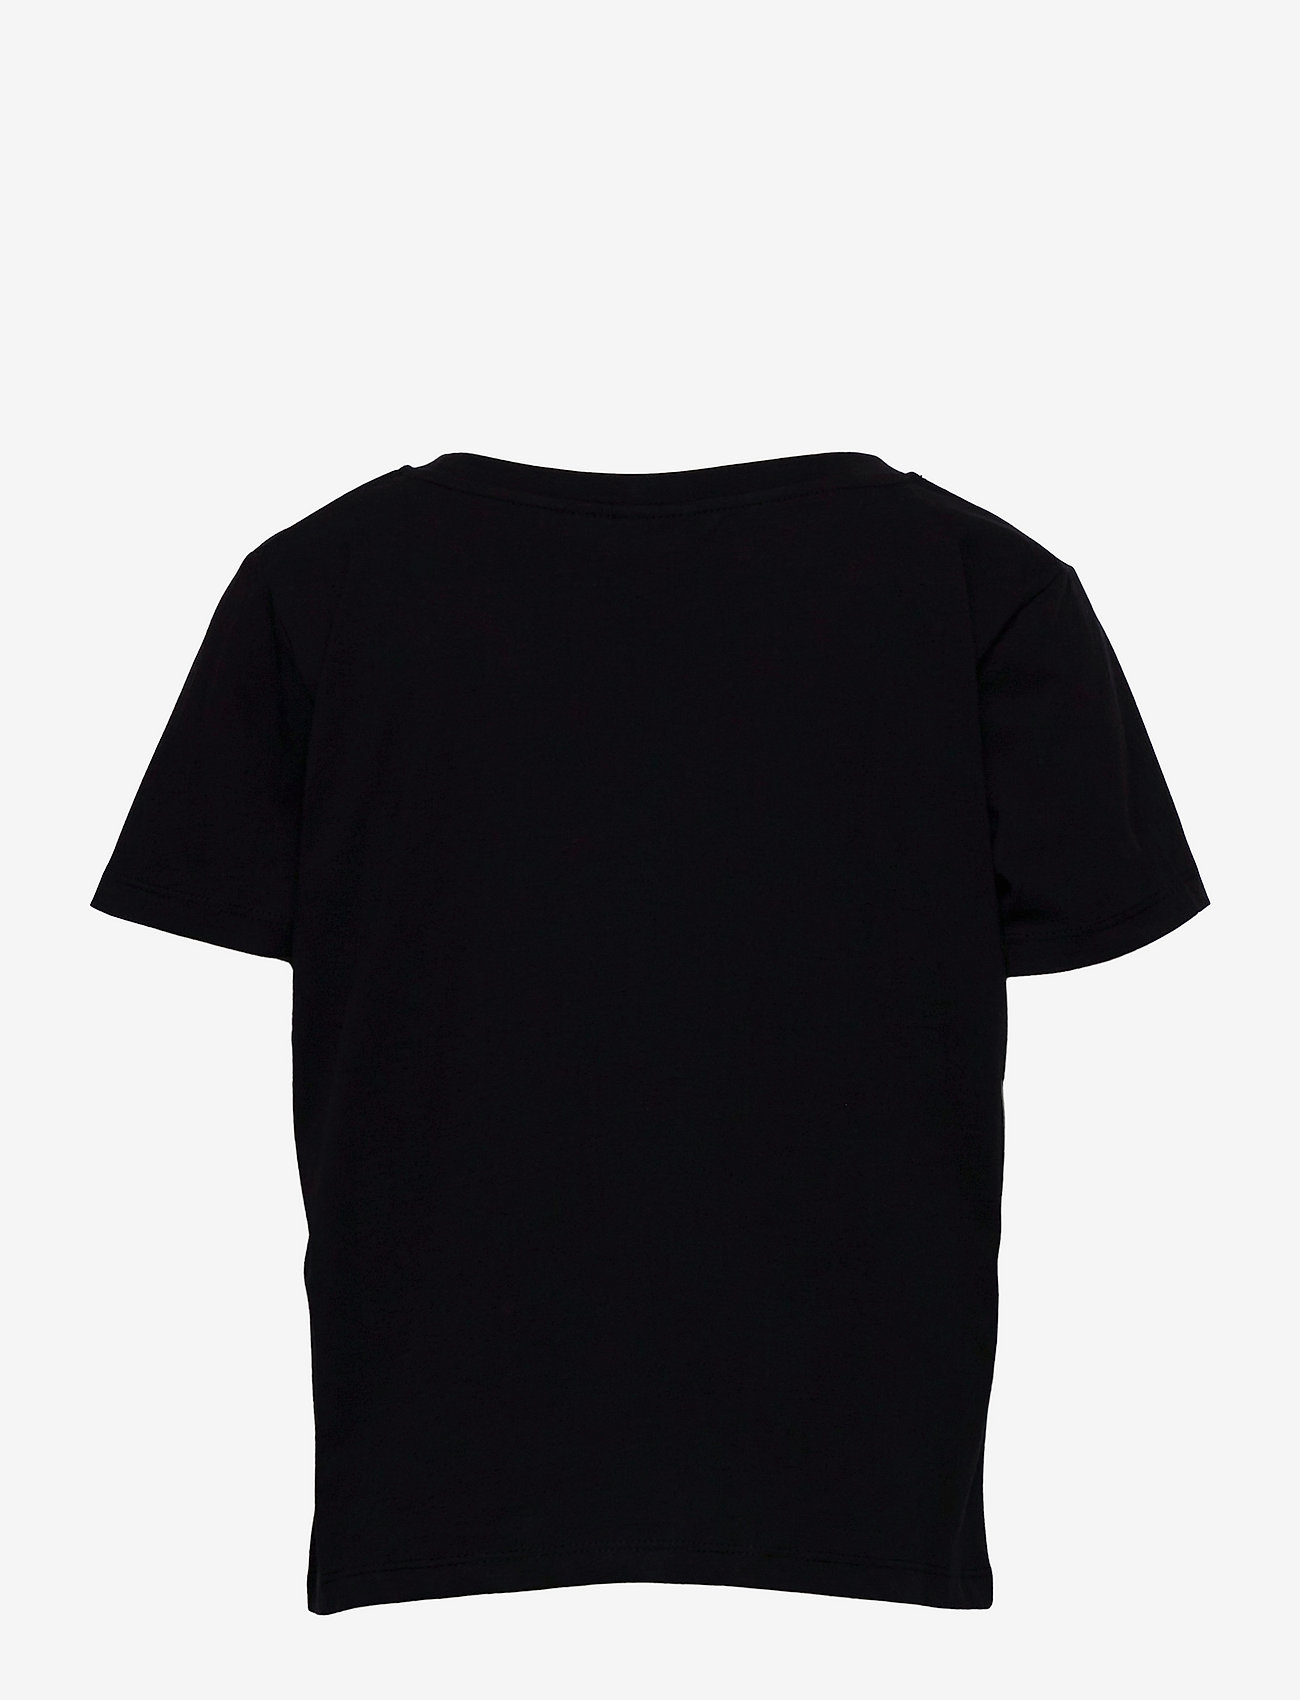 LMTD - NLFKATE  SS SHORT  R  TOP - t-shirts - black - 1